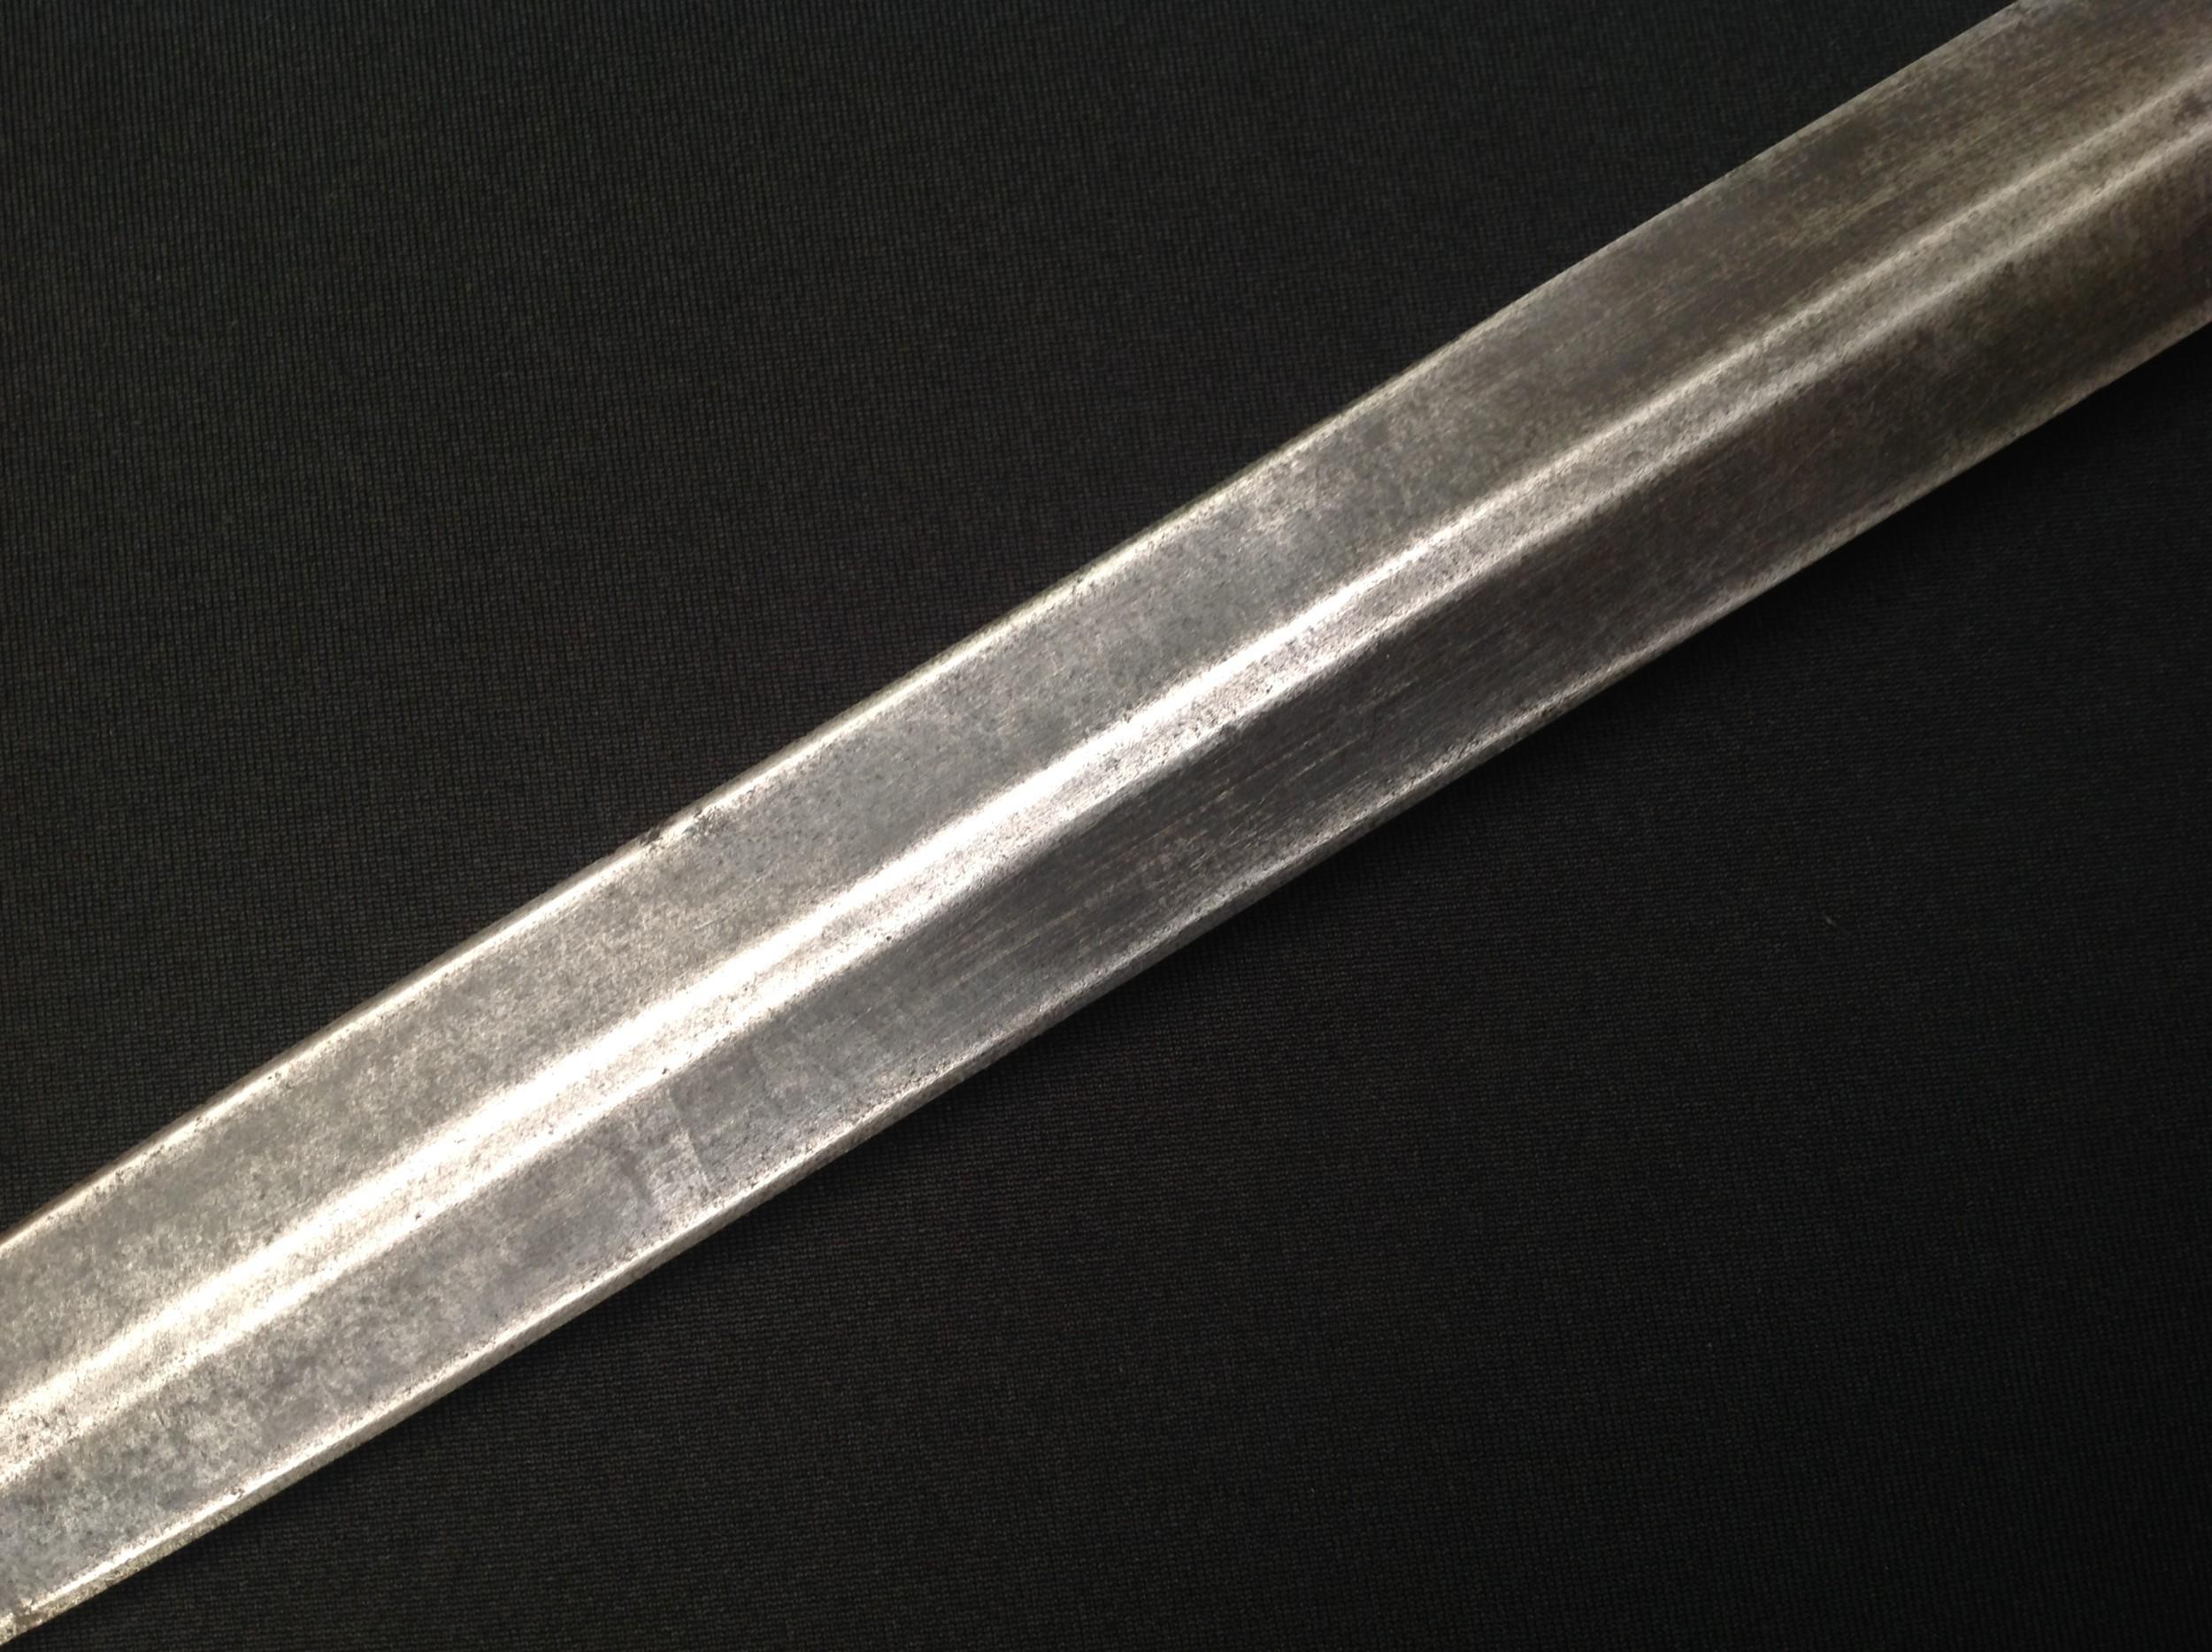 British 1888 pattern Lee-Metford bayonet by Wilkinson, London, 30.5cm blade marked 3 02, two-piece - Image 18 of 18